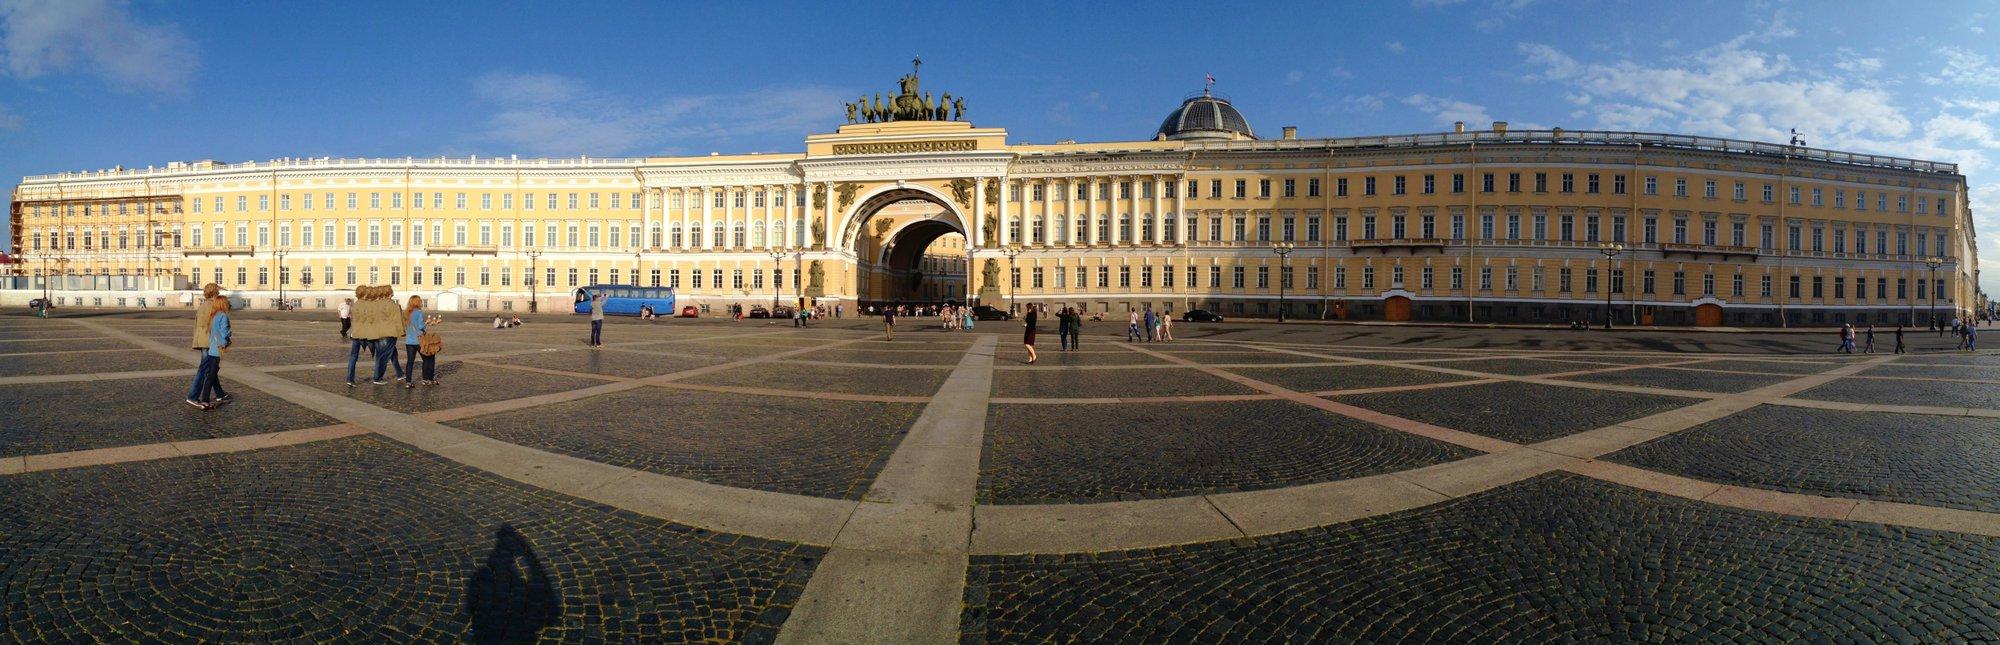 pohľad na Palácové námestie od Zimného paláca